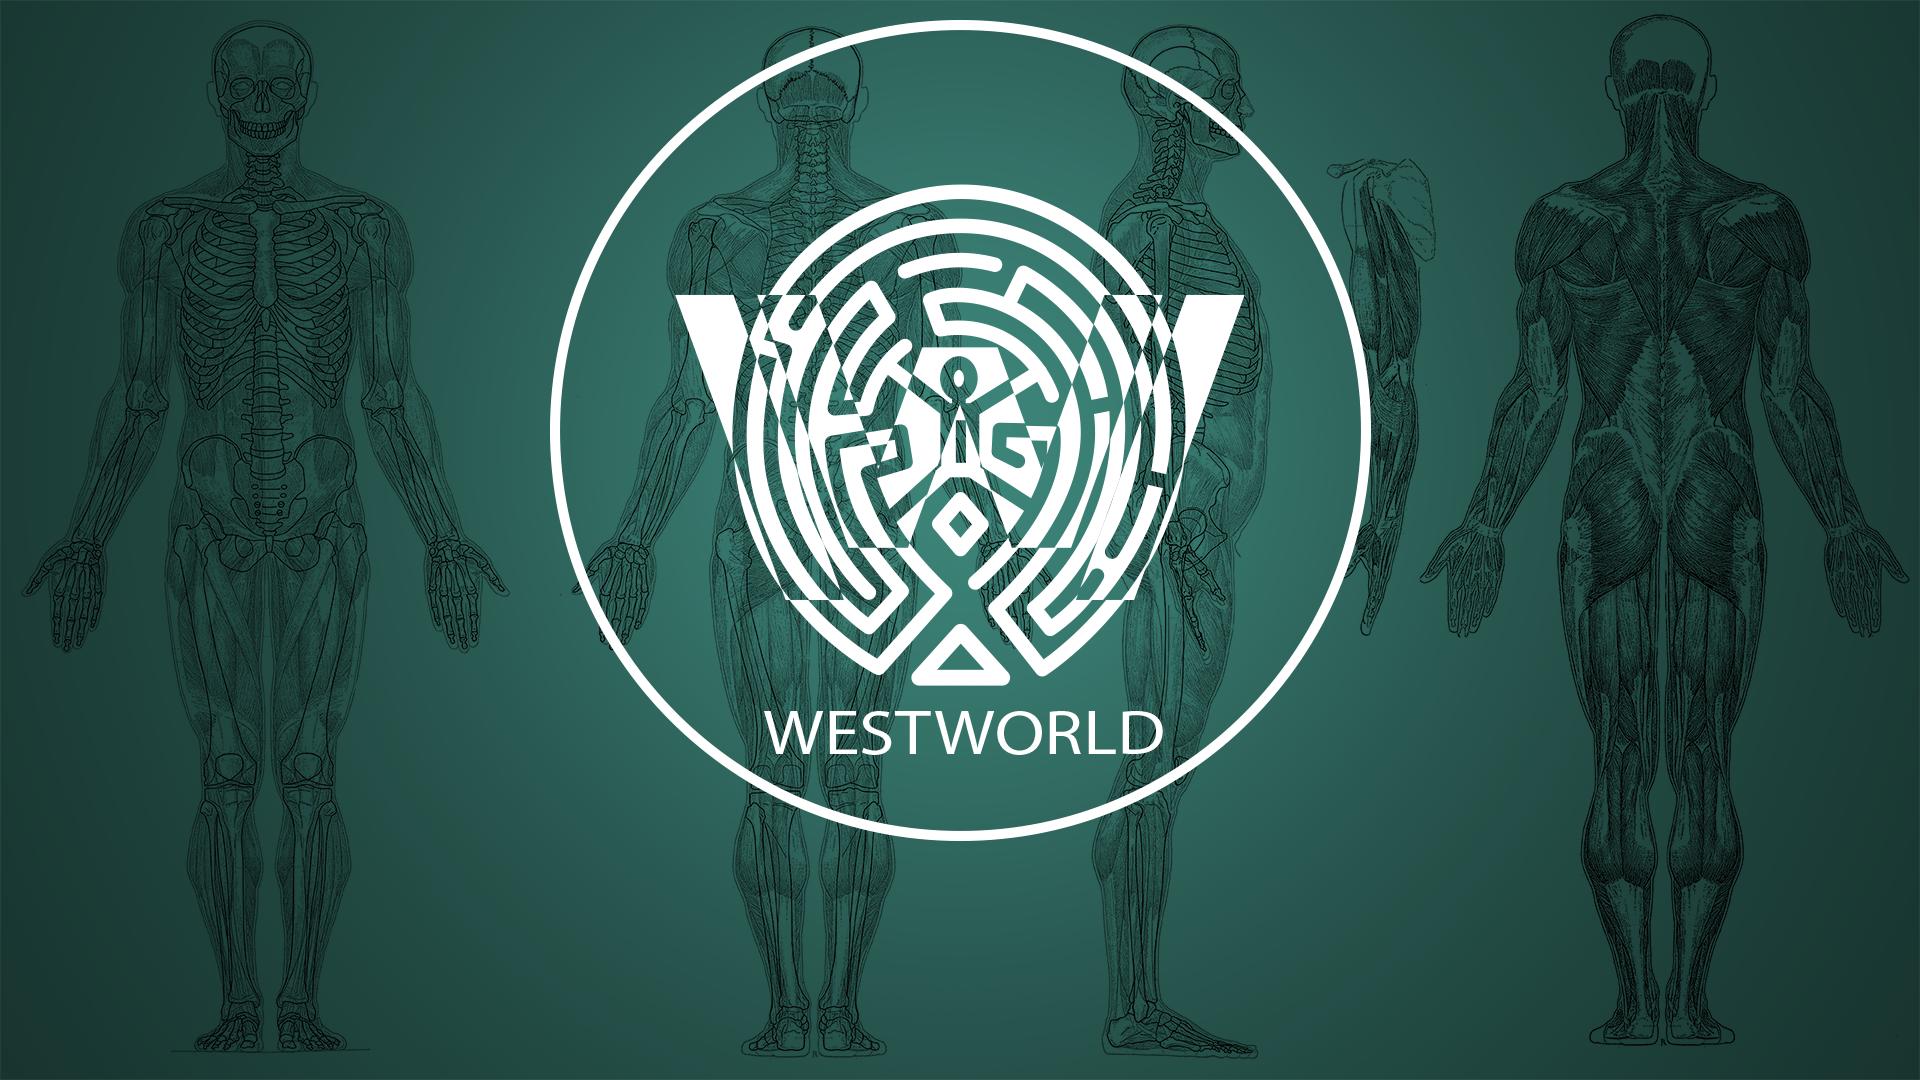 1920x1080 desktop background reddit: Any Westworld Fans Here?[1920x1080]